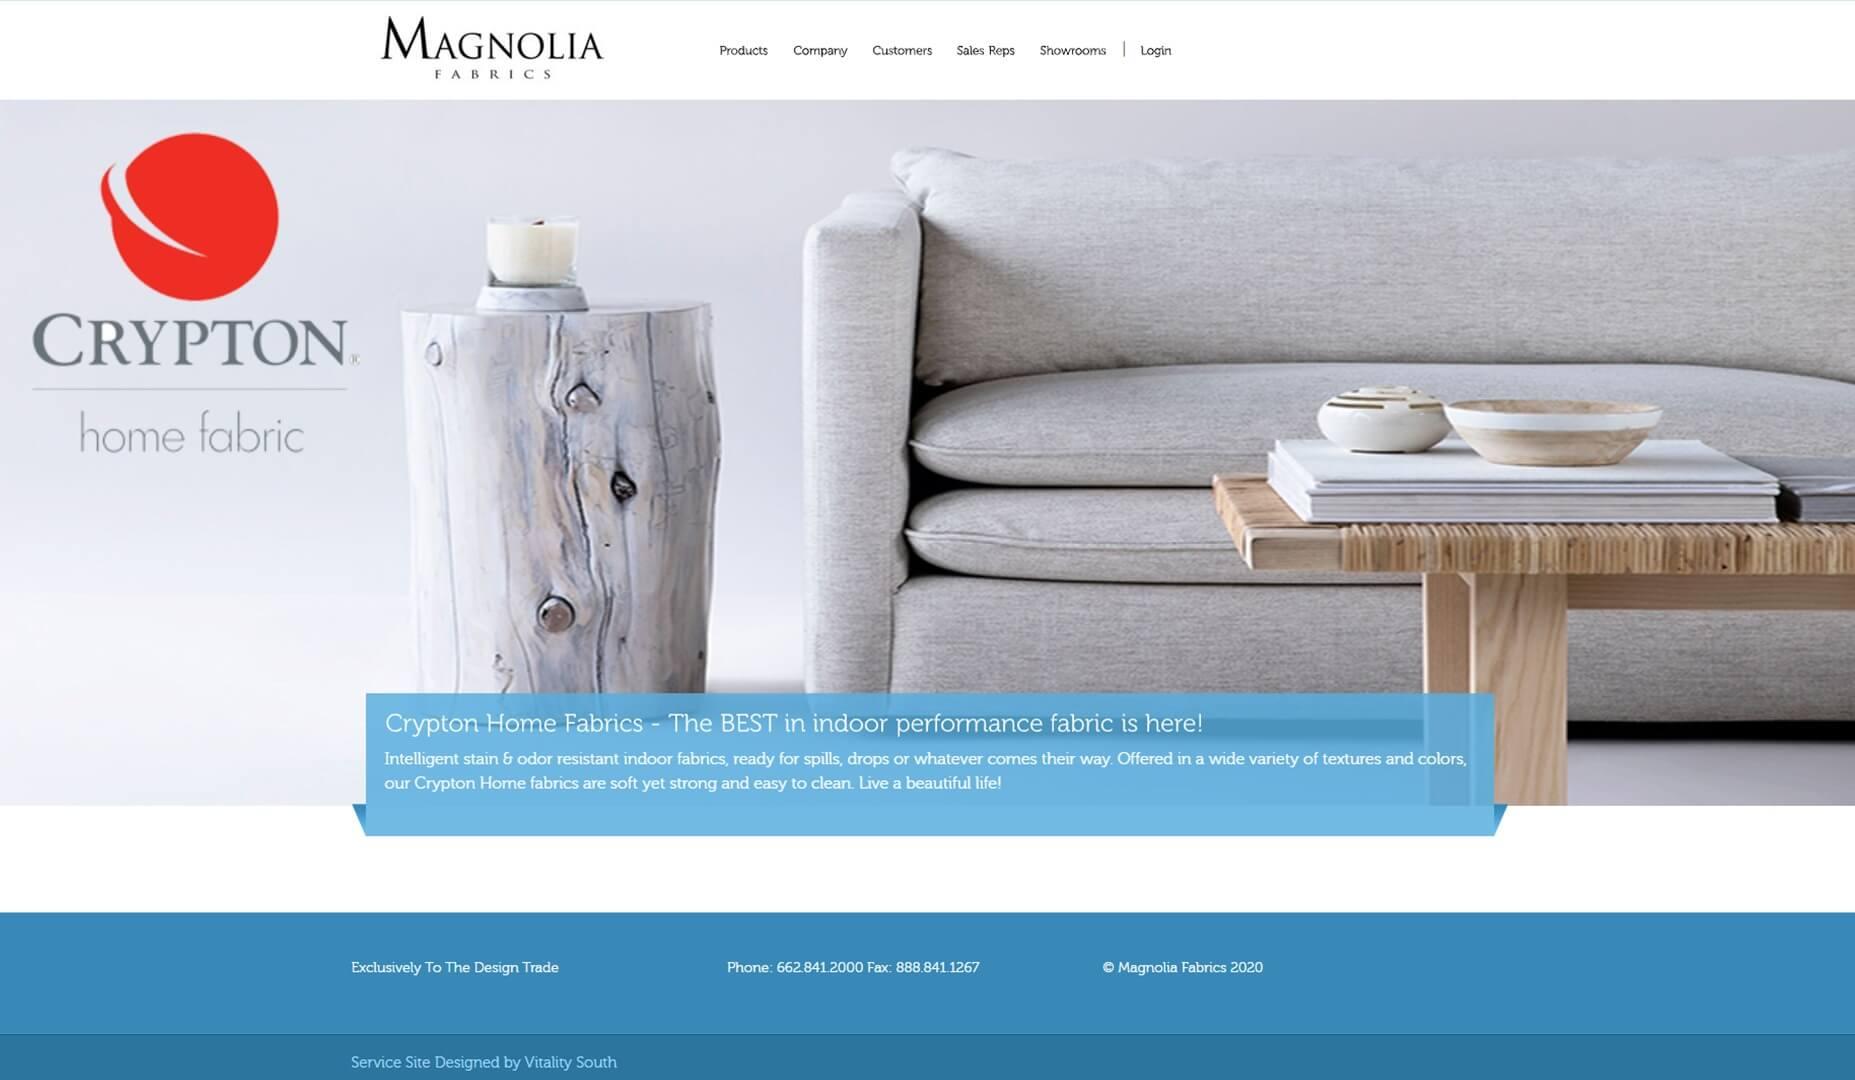 magnolia fab